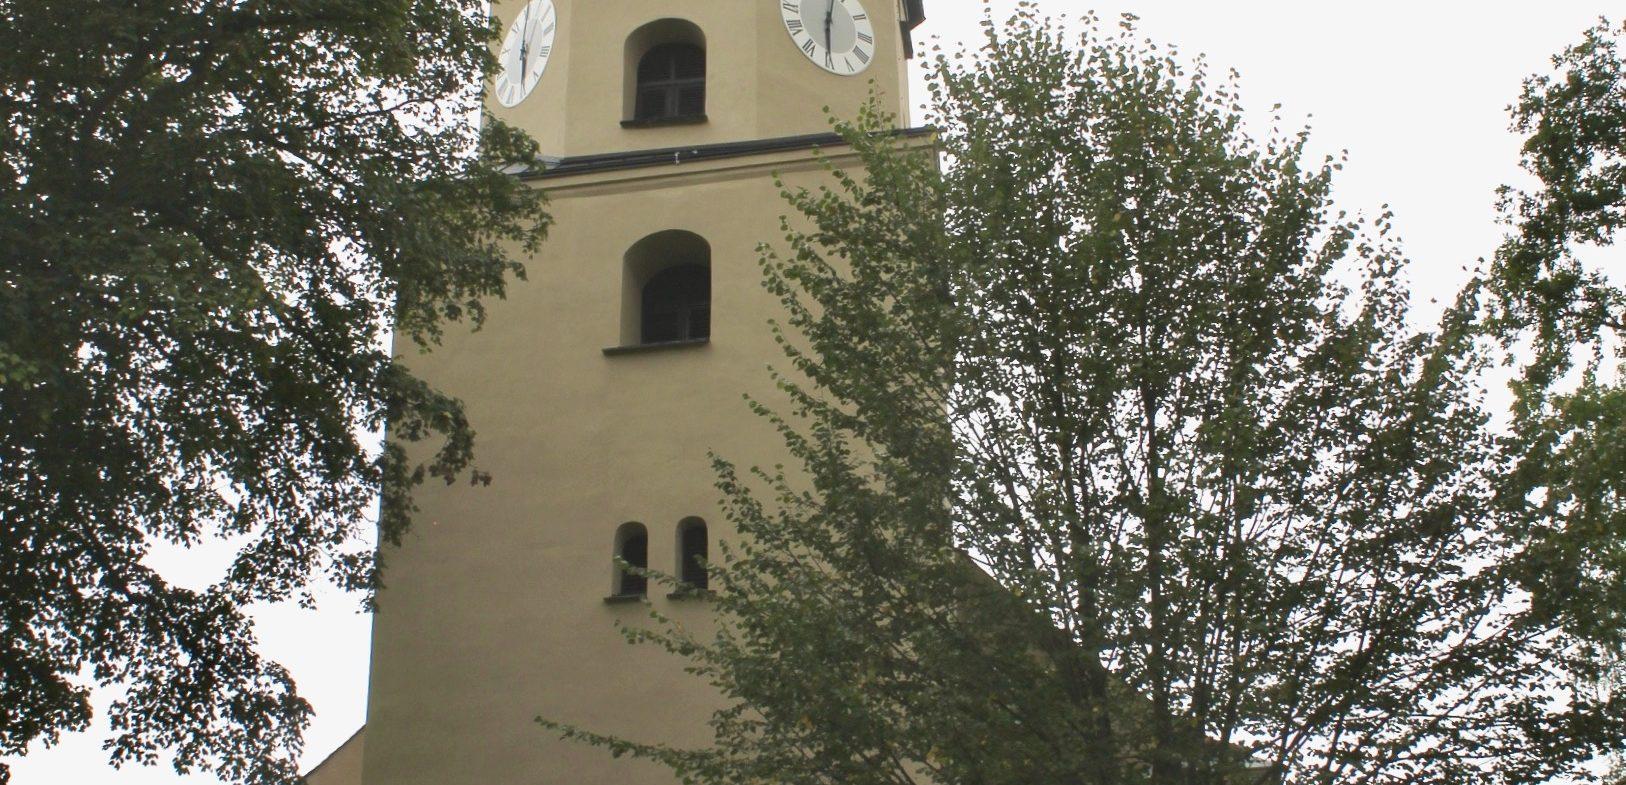 Ev.-Luth. St.-Bartholomäus-Kirchgemeinde Treuen